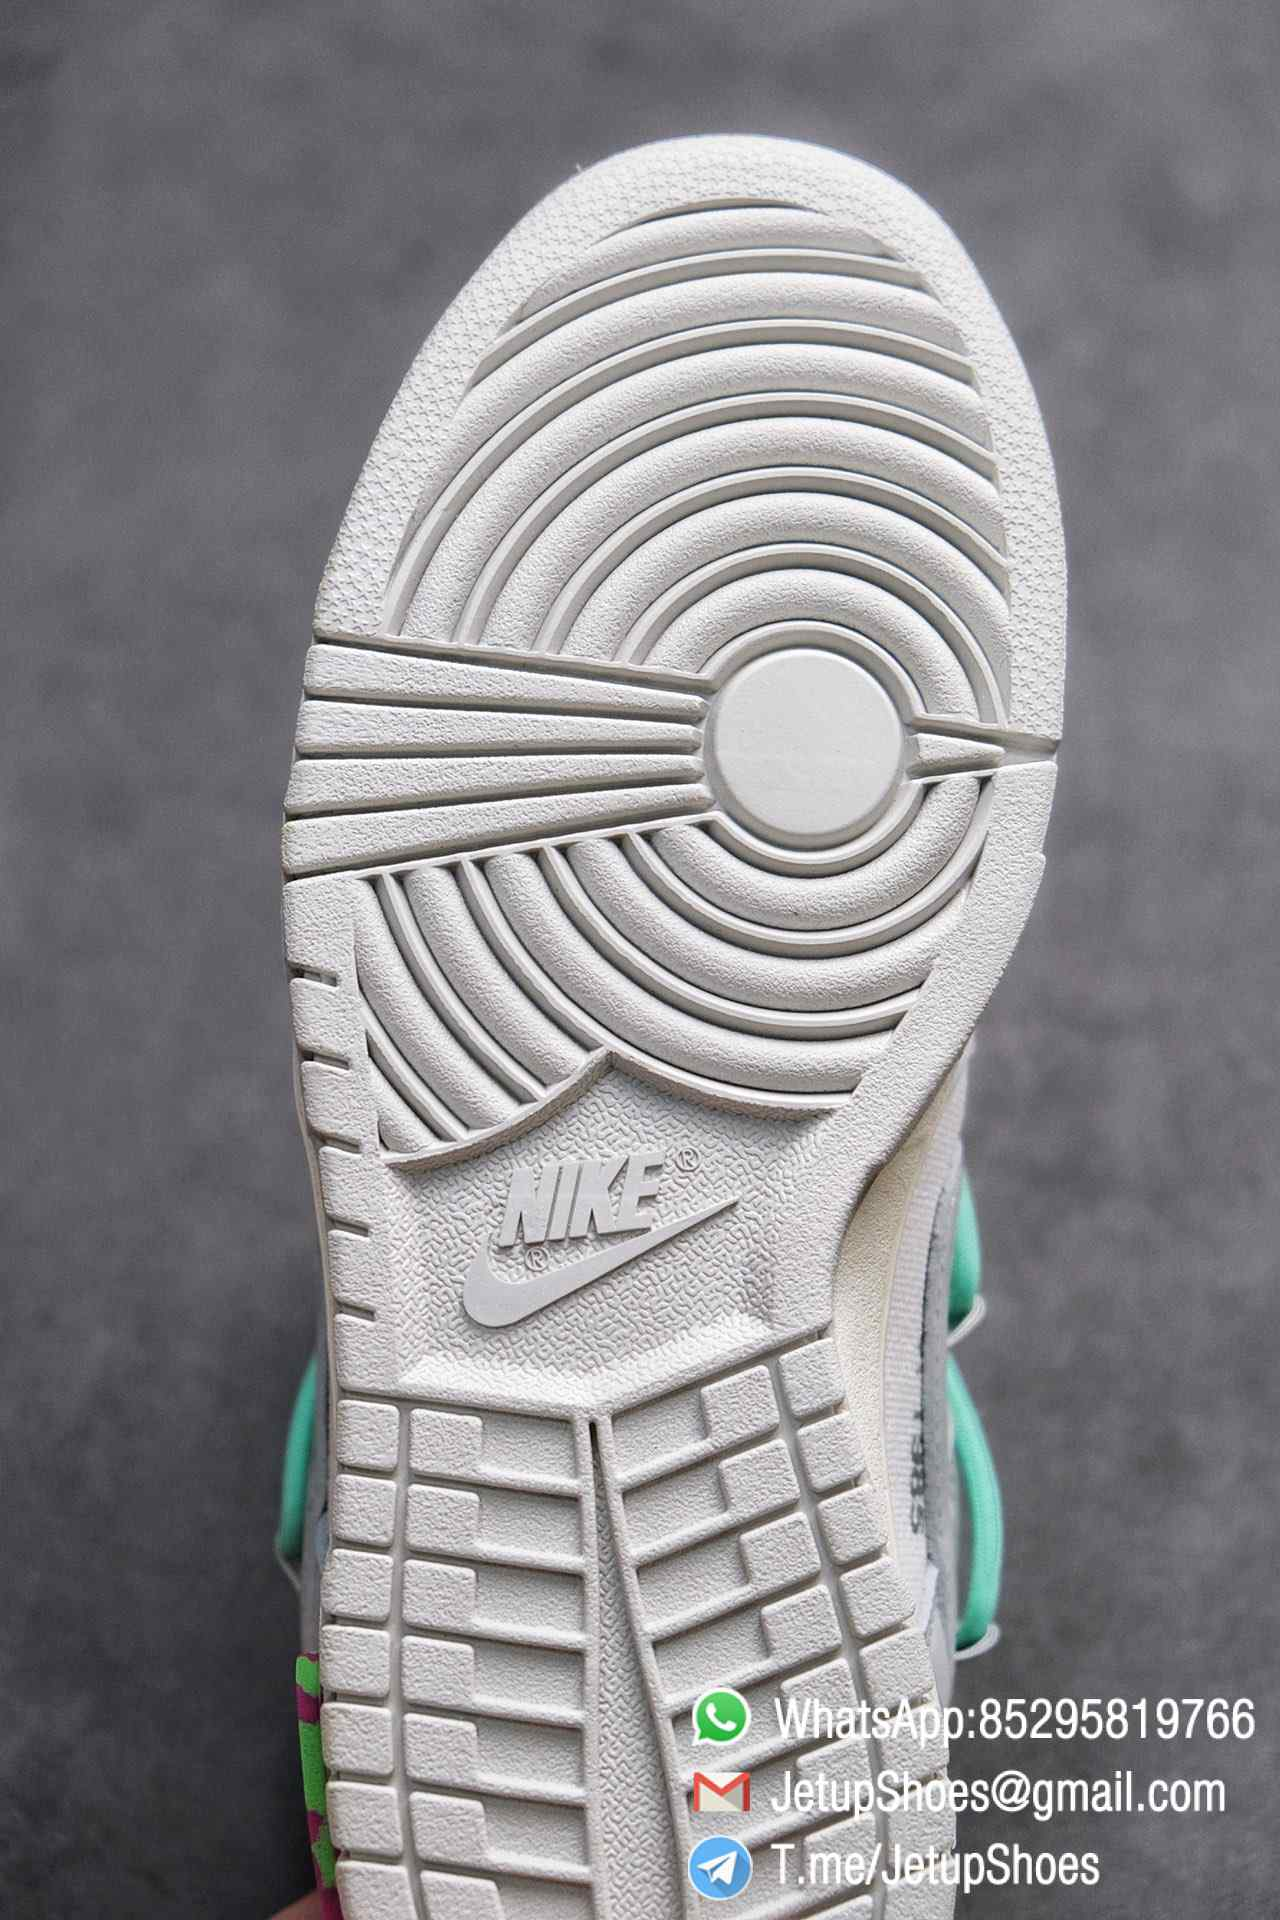 Best Replica Nike Sneakers 0ff White x Nike Dunk Low 04 of 50 SKU DM1602 114 Top RepSneakers Supplier 018